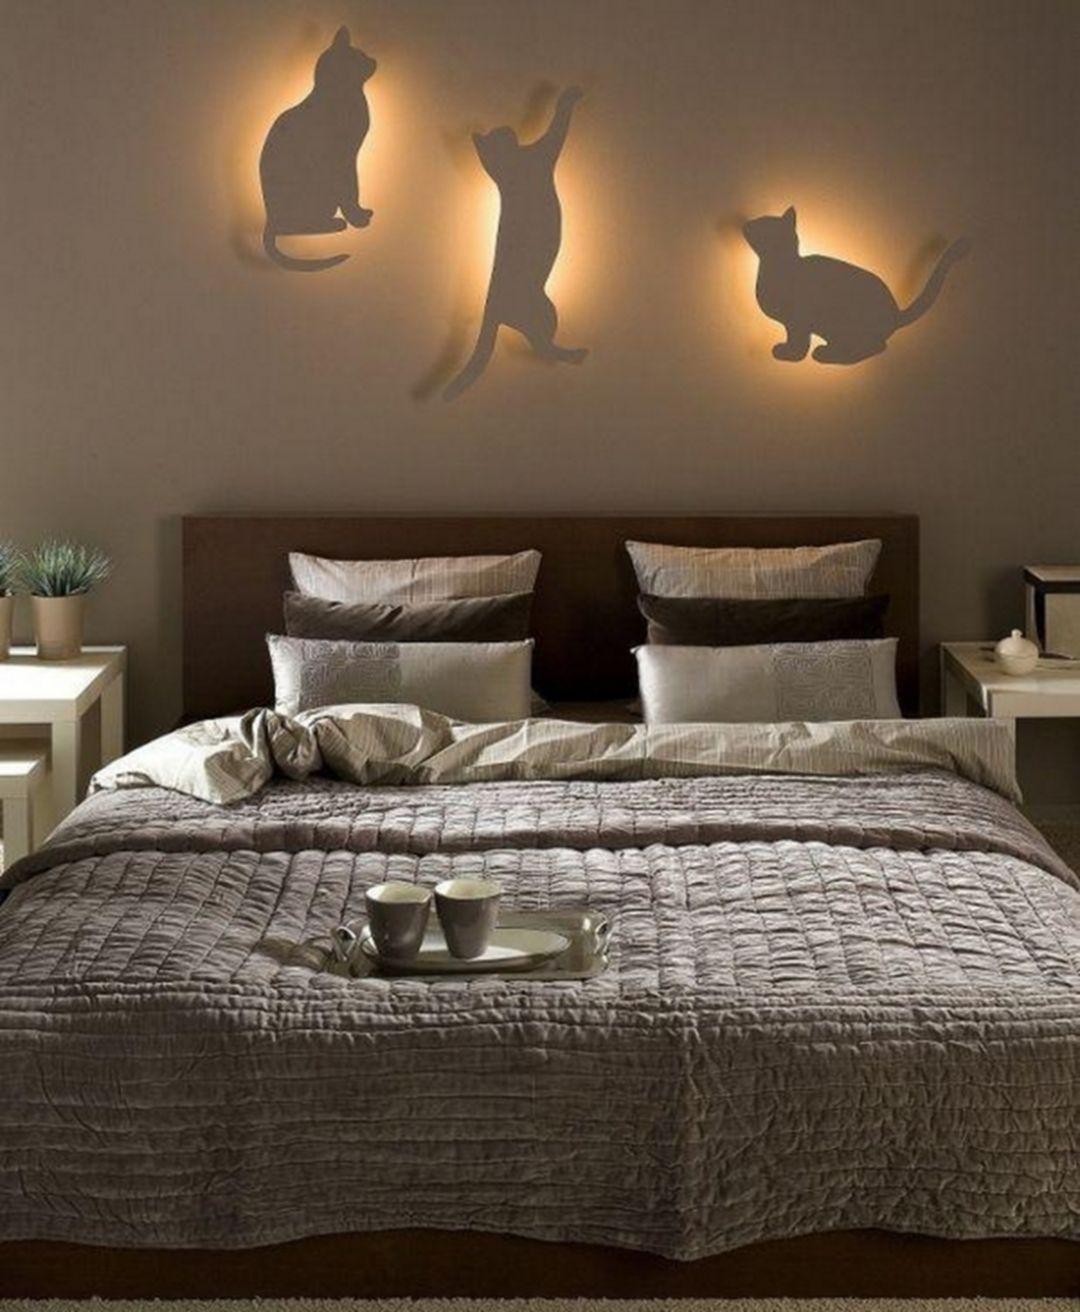 Wonderful 30 Diy Creative Bedroom Lighting Ideas For The Home